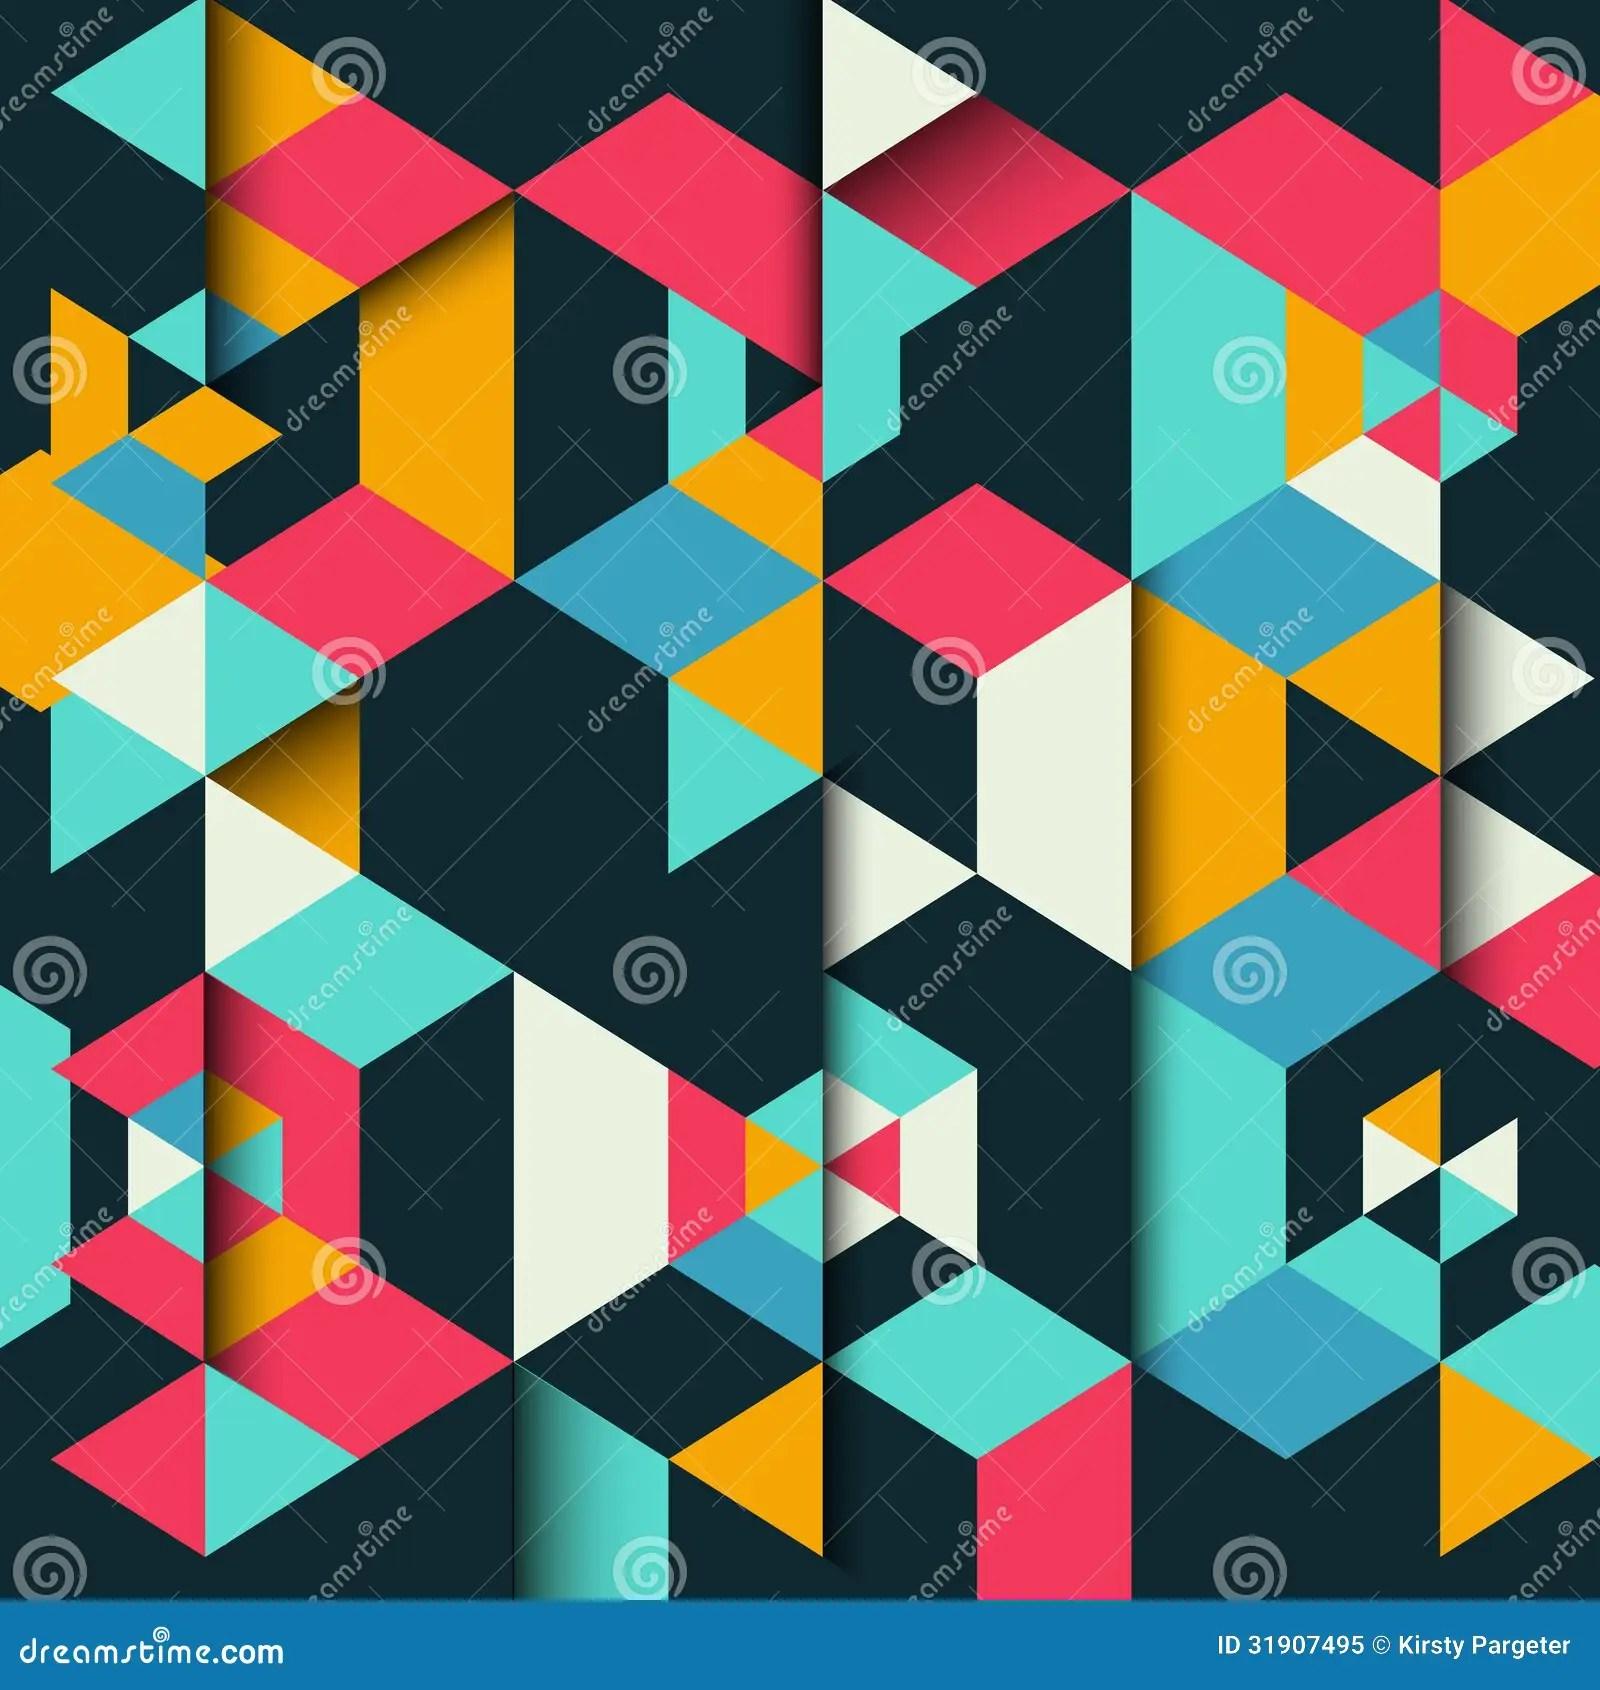 3d Dj Wallpaper Free Download Fundo Geom 233 Trico Abstrato Foto De Stock Royalty Free